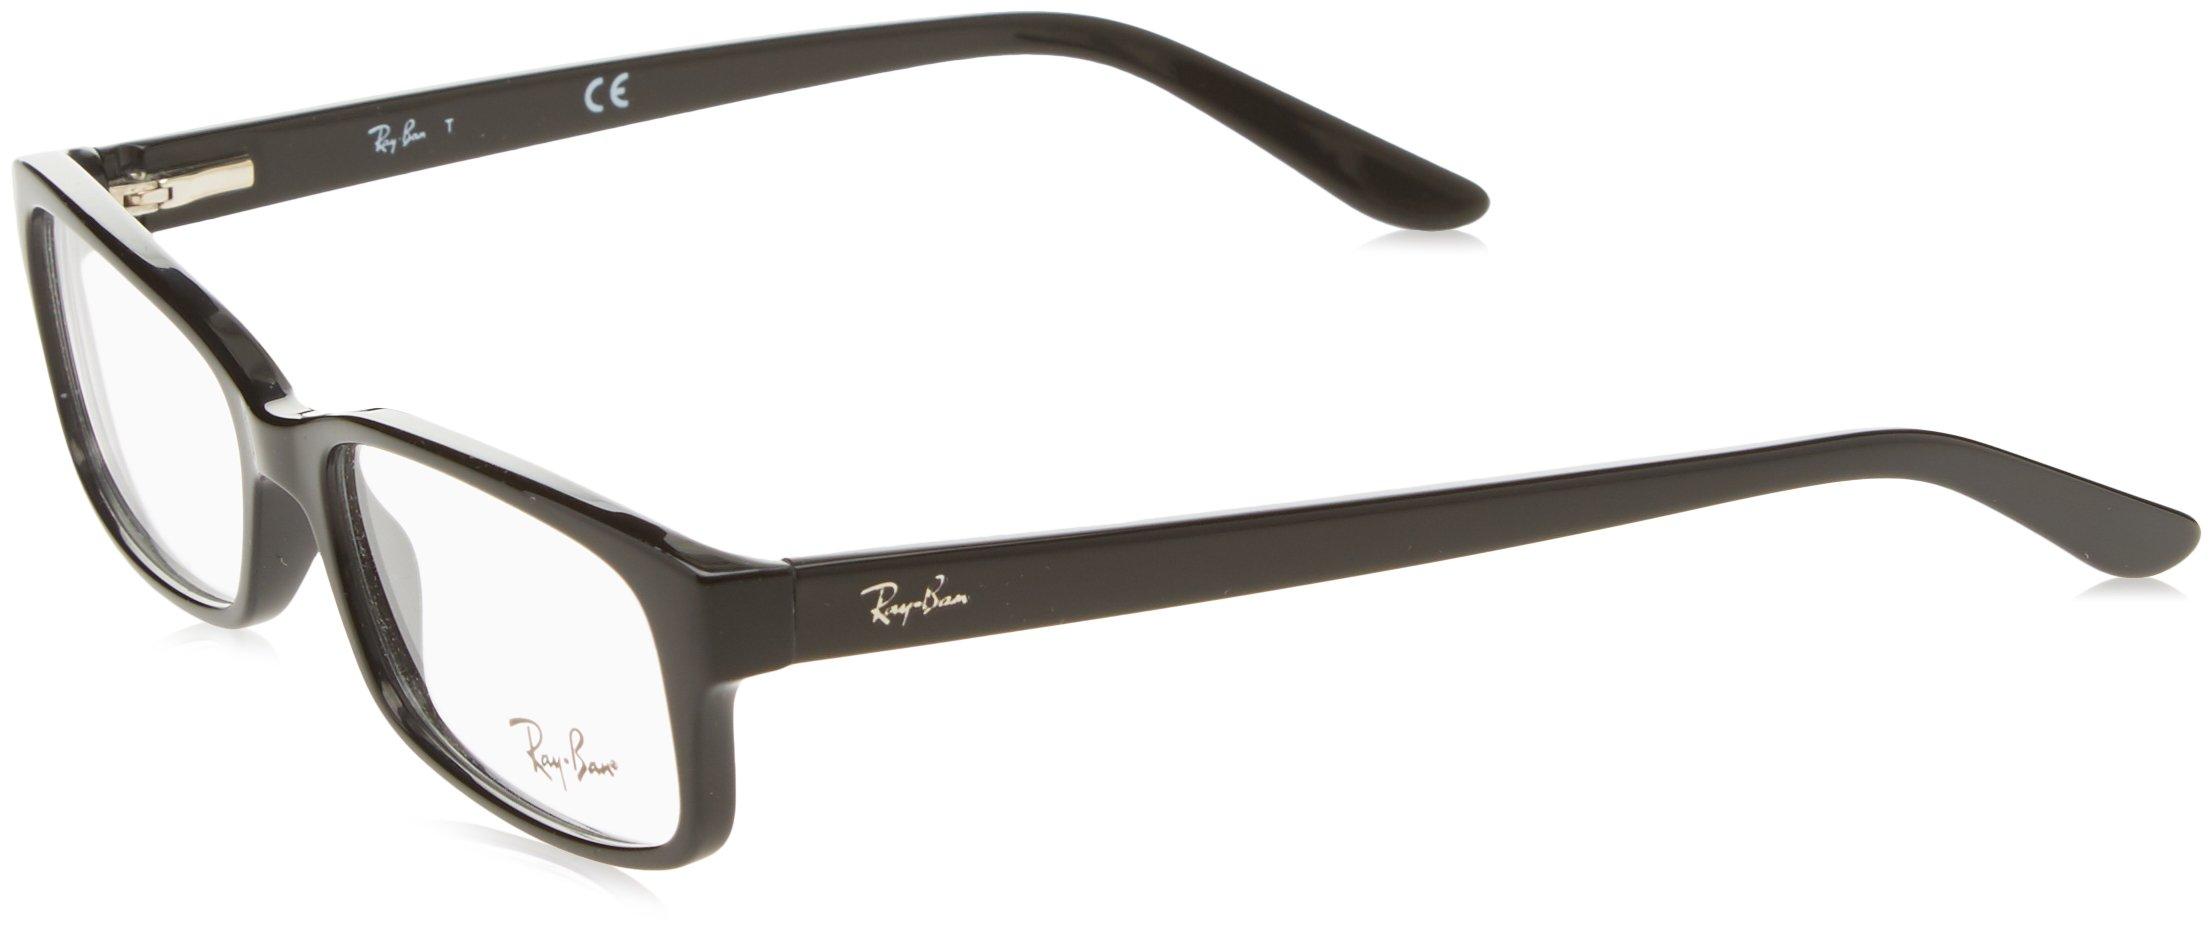 Ray-Ban Rx5187 Rectangular Eyeglasses,Shiny Black,50 mm by Ray-Ban